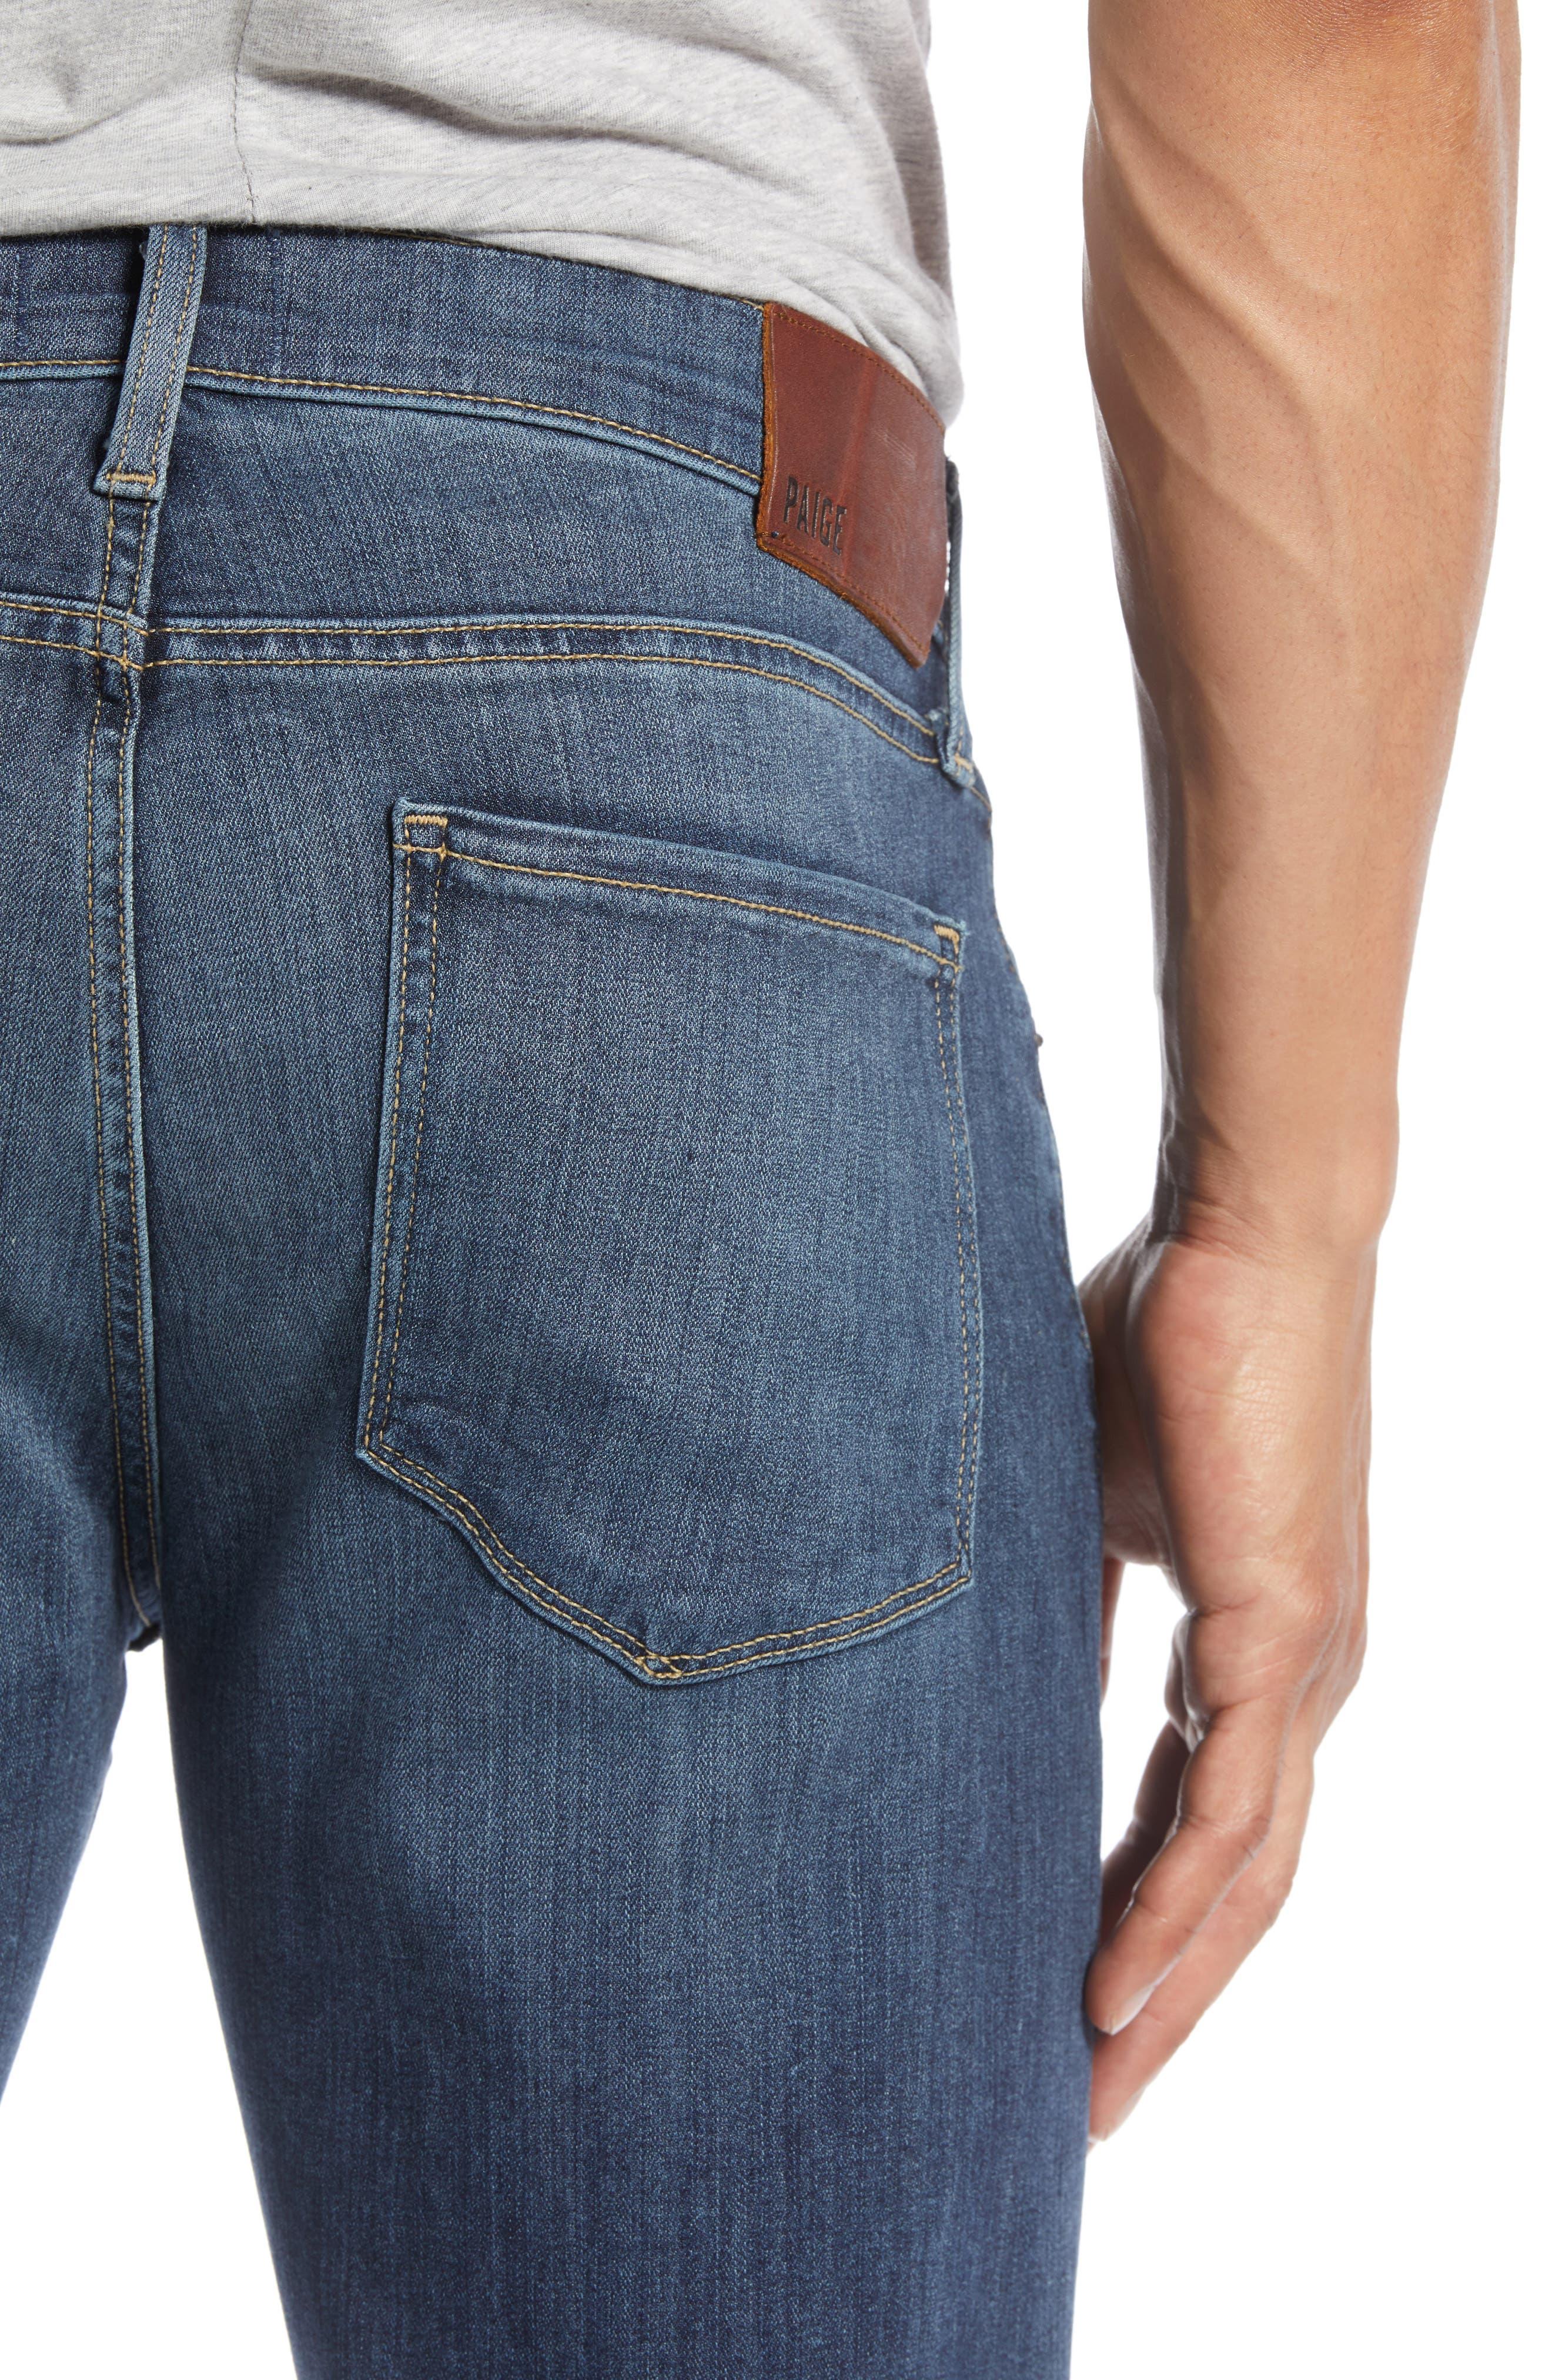 PAIGE, Transcend - Federal Slim Straight Leg Jeans, Alternate thumbnail 6, color, BIRCH